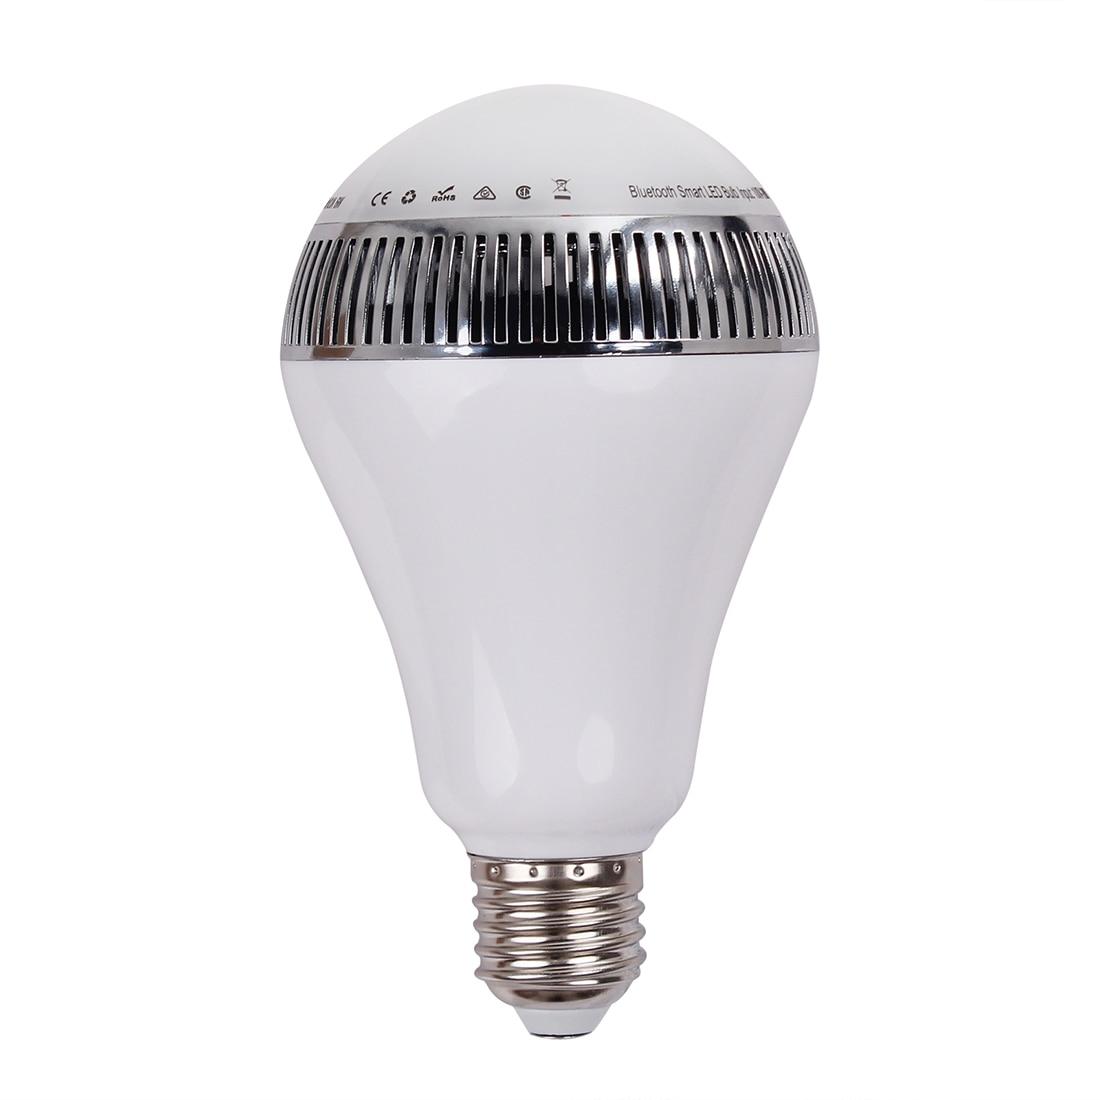 CSS Wireless Bluetooth Speaker E27 LED RGB Light Music Bulb Lamp APP Control Color Change s15 smart led bulb bluetooth 4 0 speaker app control support